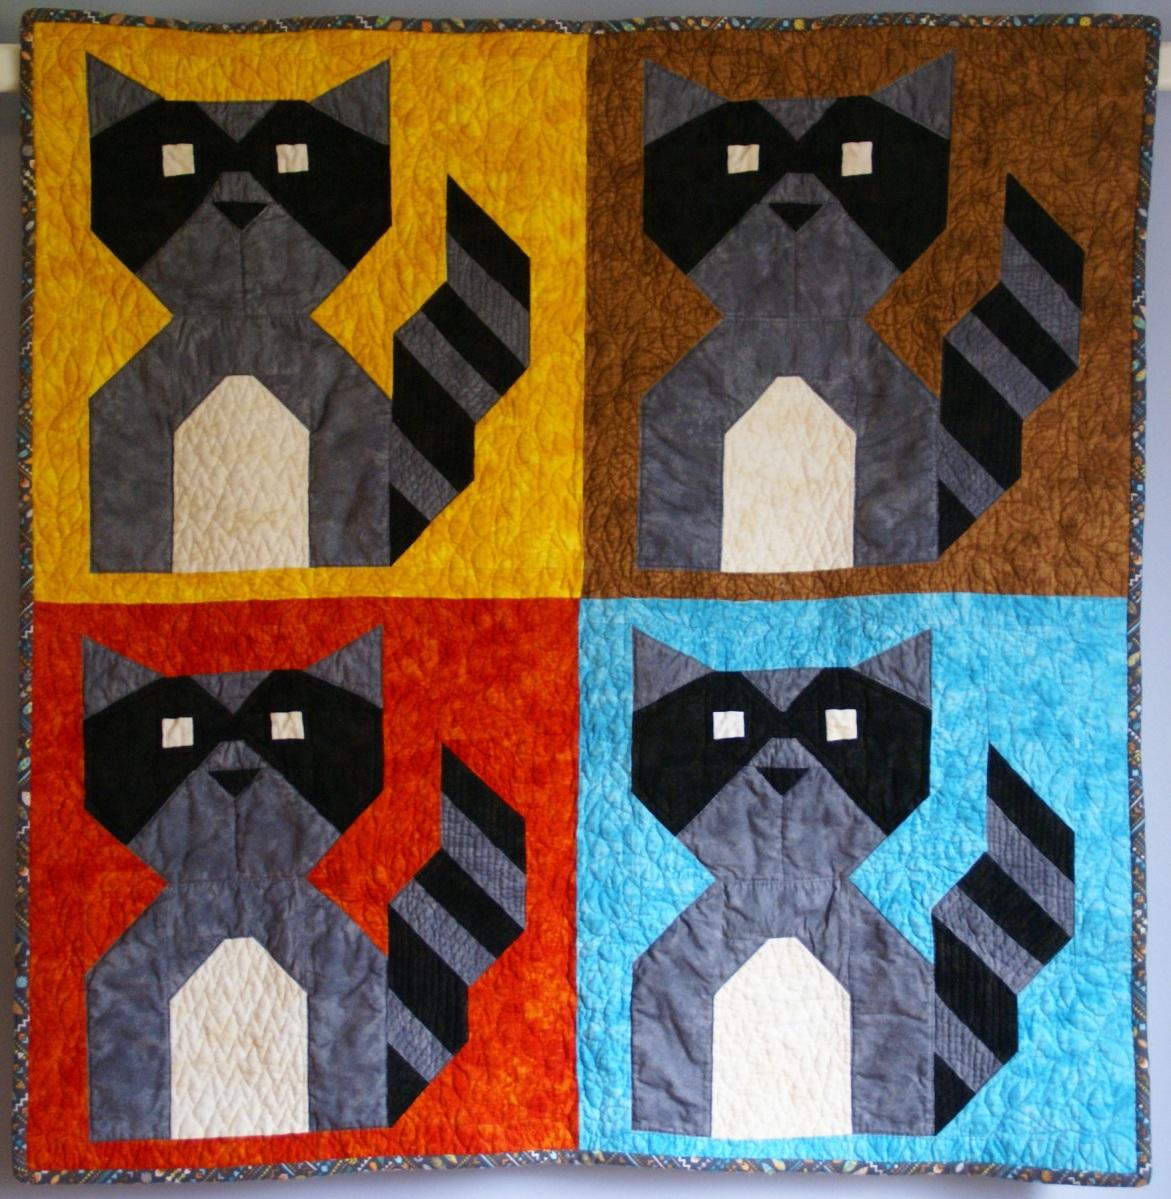 Published – Baby Raccoon Bandit Quilt | Lori Miller Designs